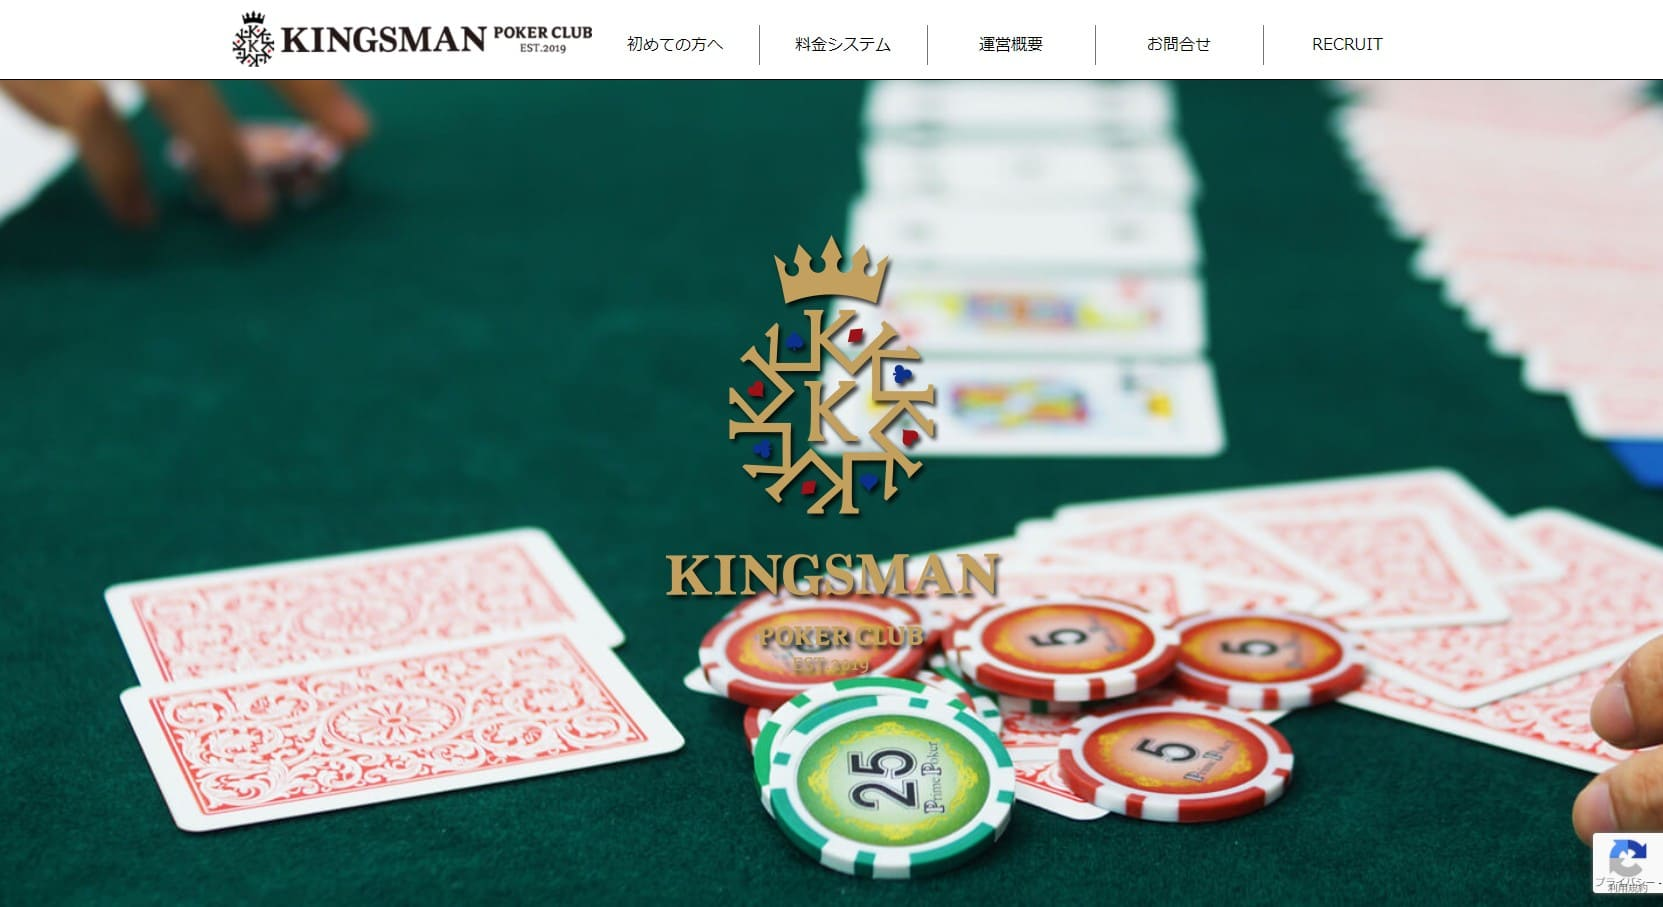 POKER CLUB KINGSMANのウェブサイト画像。